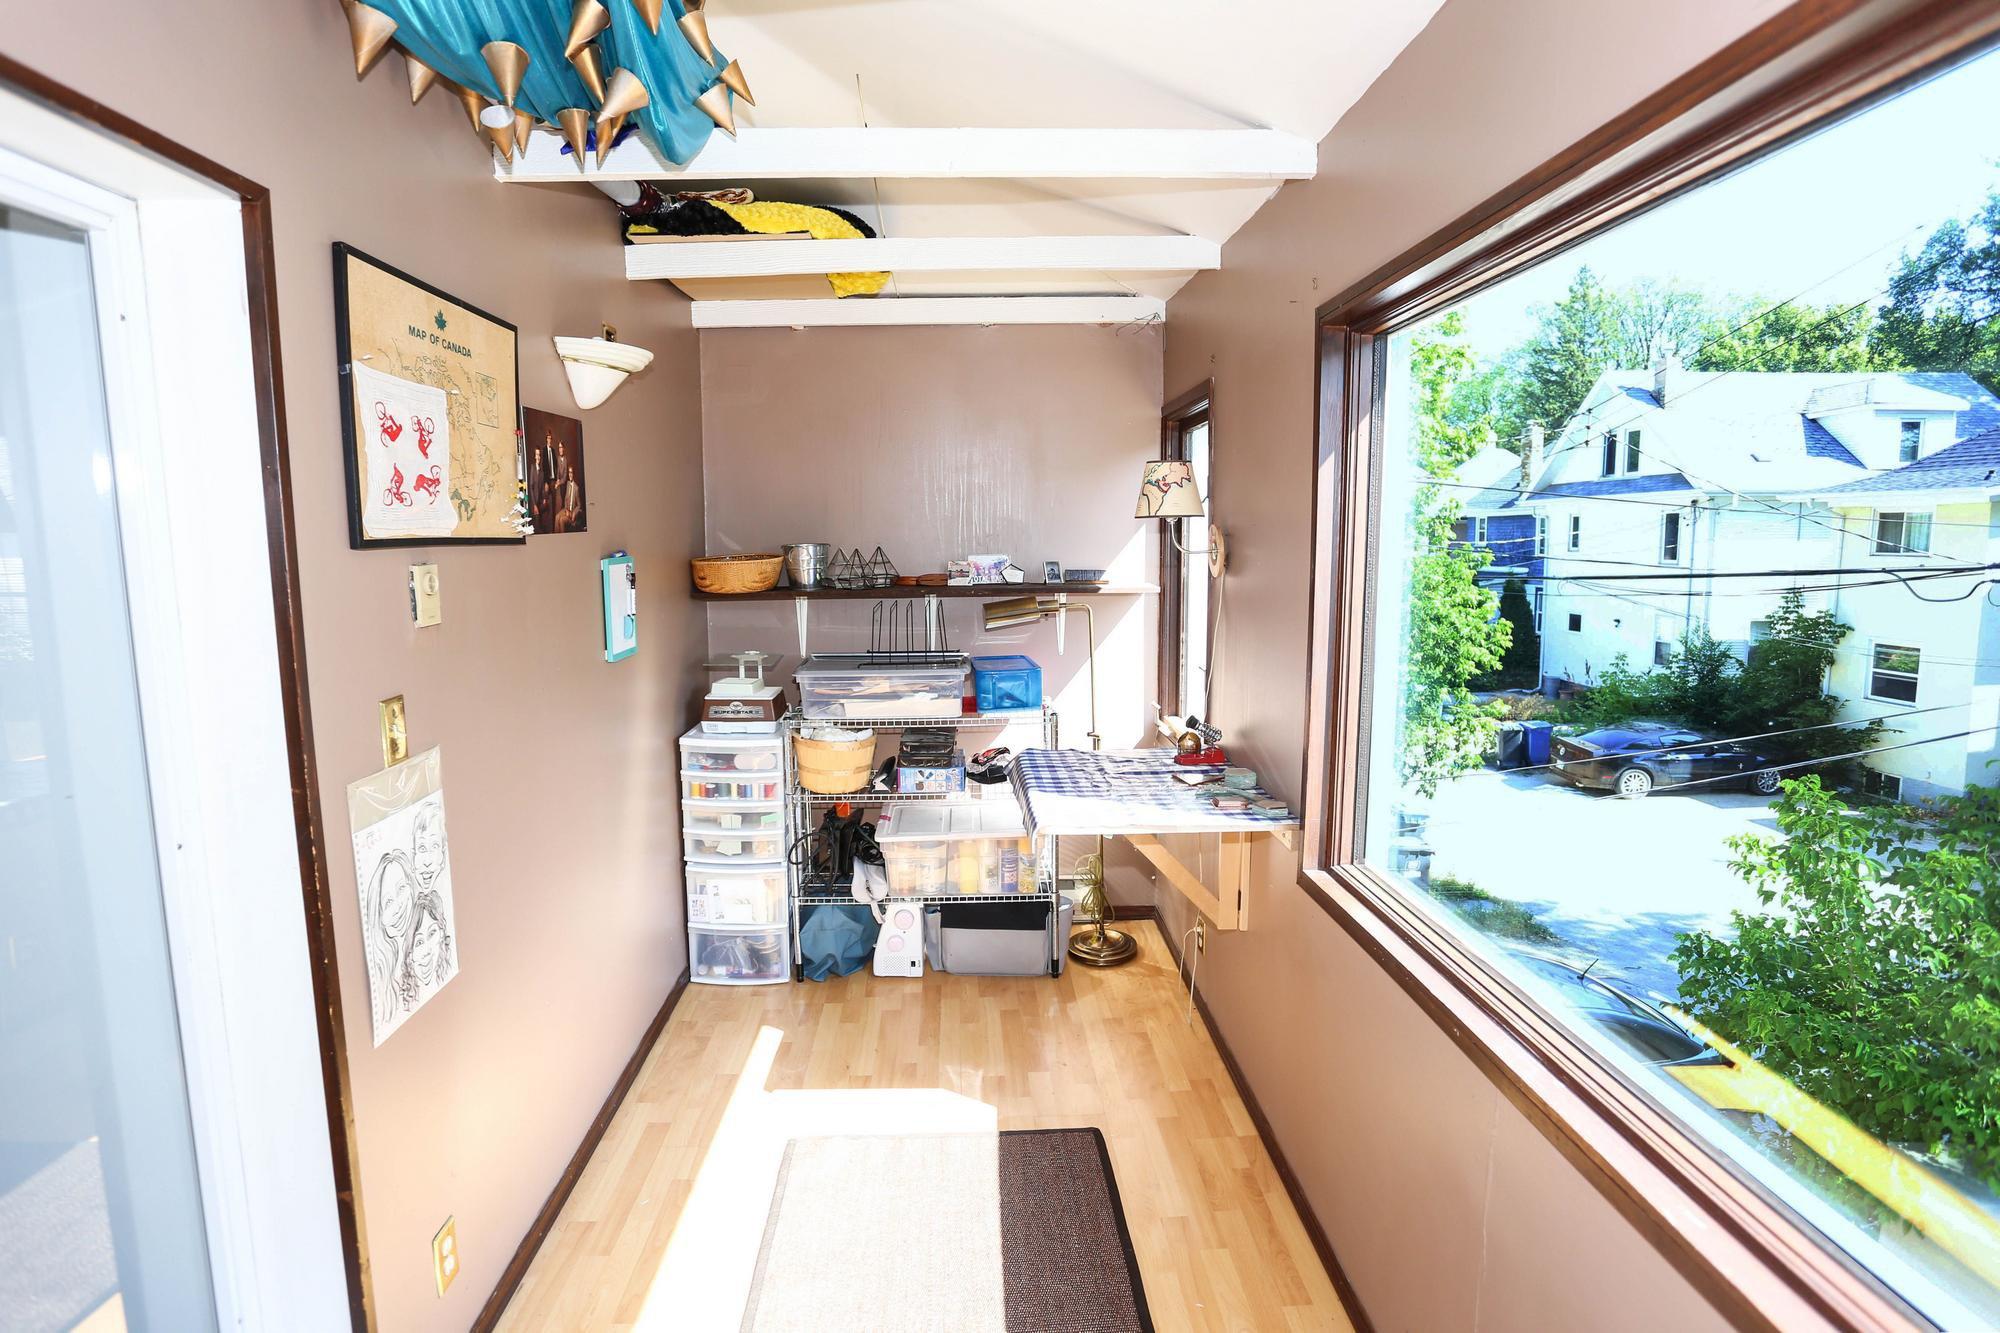 Photo 24: Photos: 105 Evanson Street in Winnipeg: Wolseley Single Family Detached for sale (5B)  : MLS®# 1821900